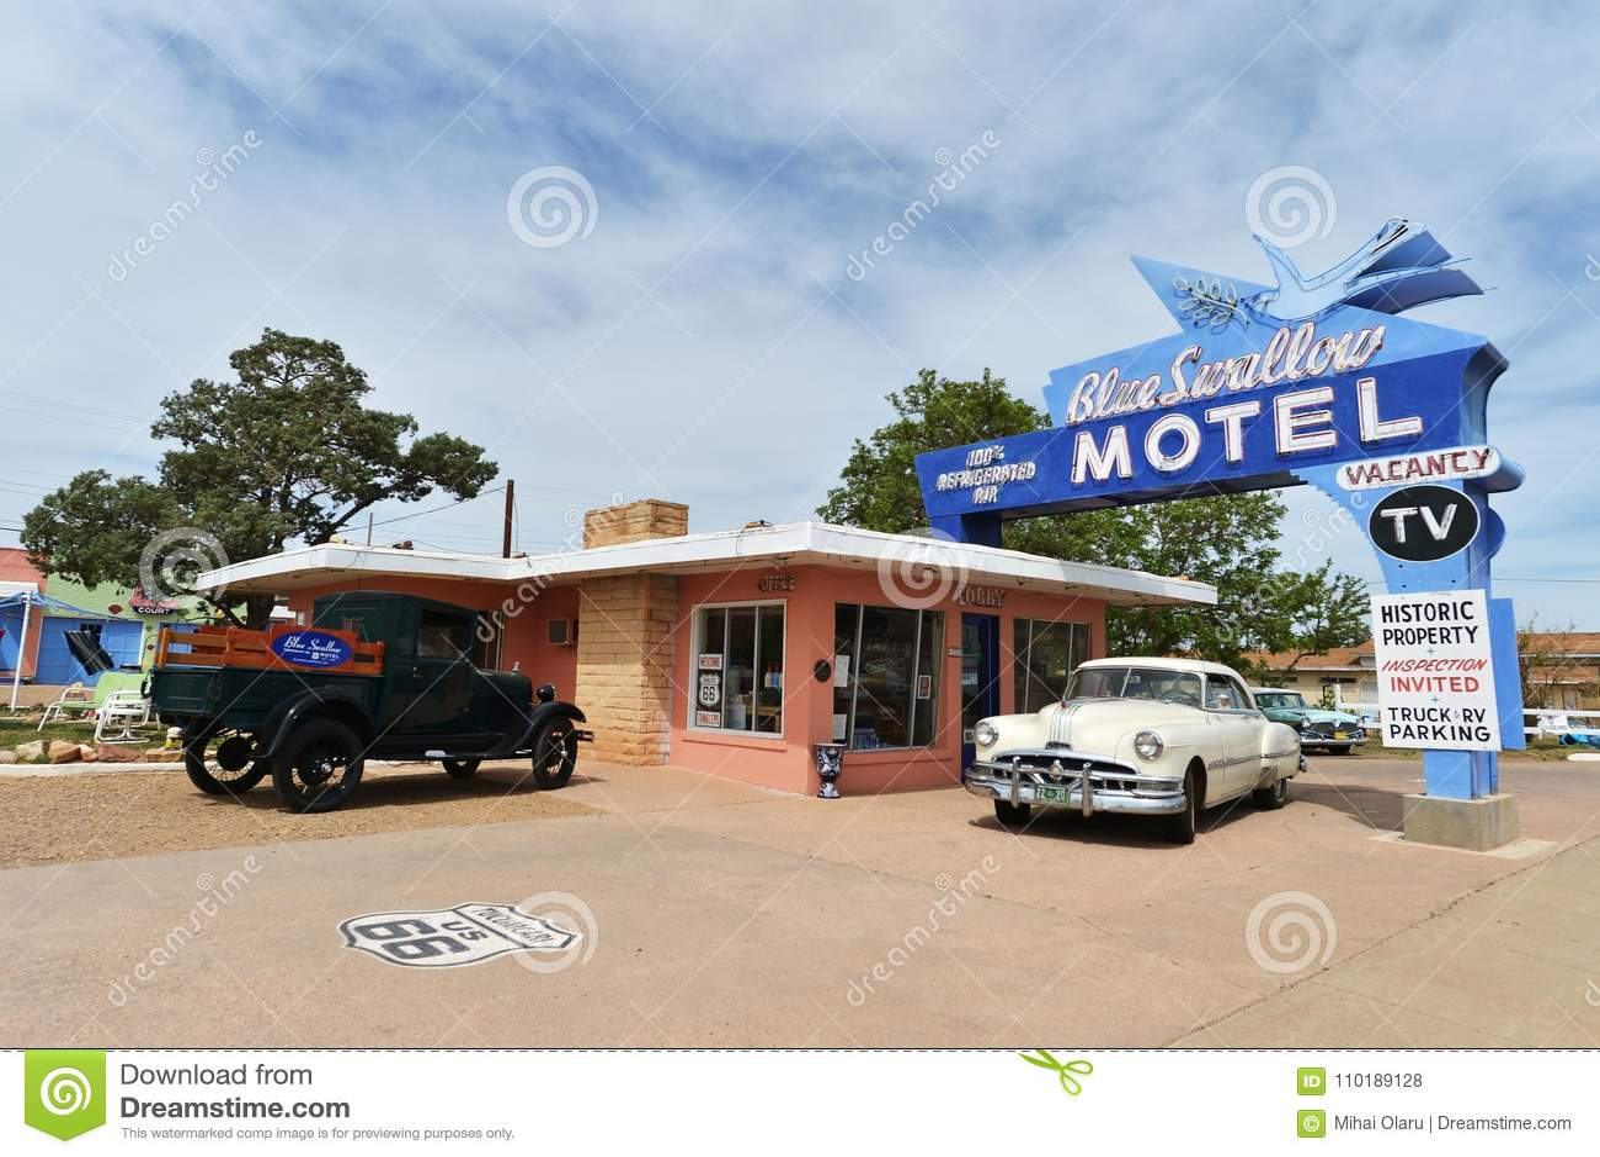 Tucumcari, New Mexiko, USA, am 25. April 2017: Altes Motel auf Route 66